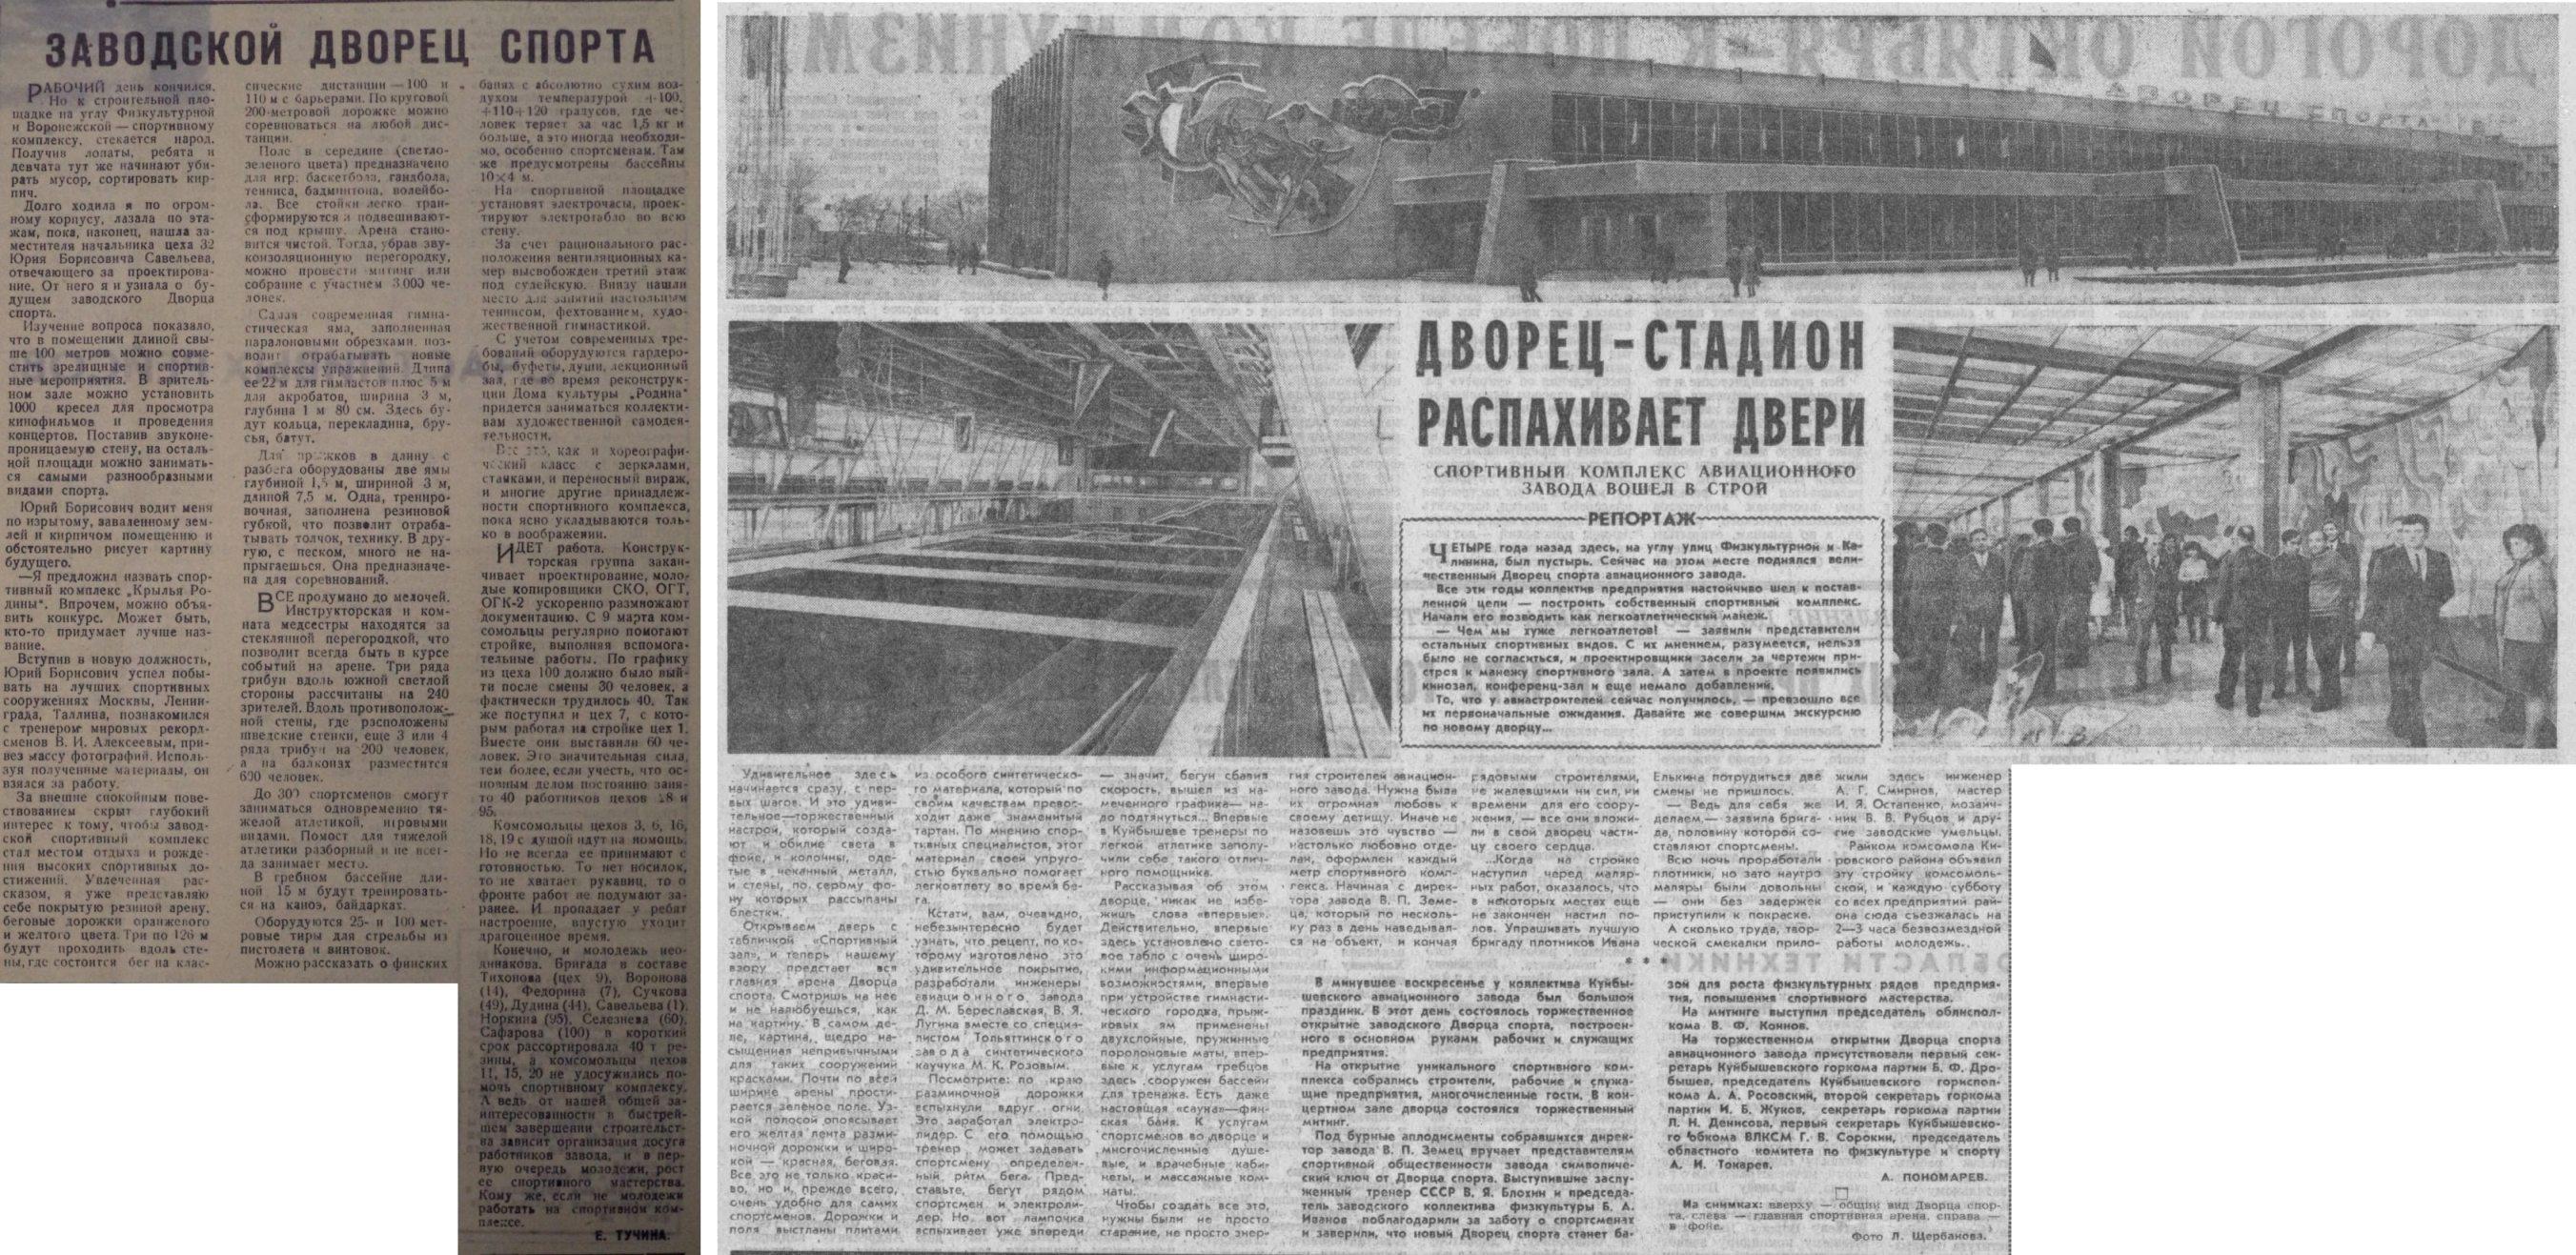 Физкультурная-ФОТО-71-За ударные темпы-1971-2 апреля-min